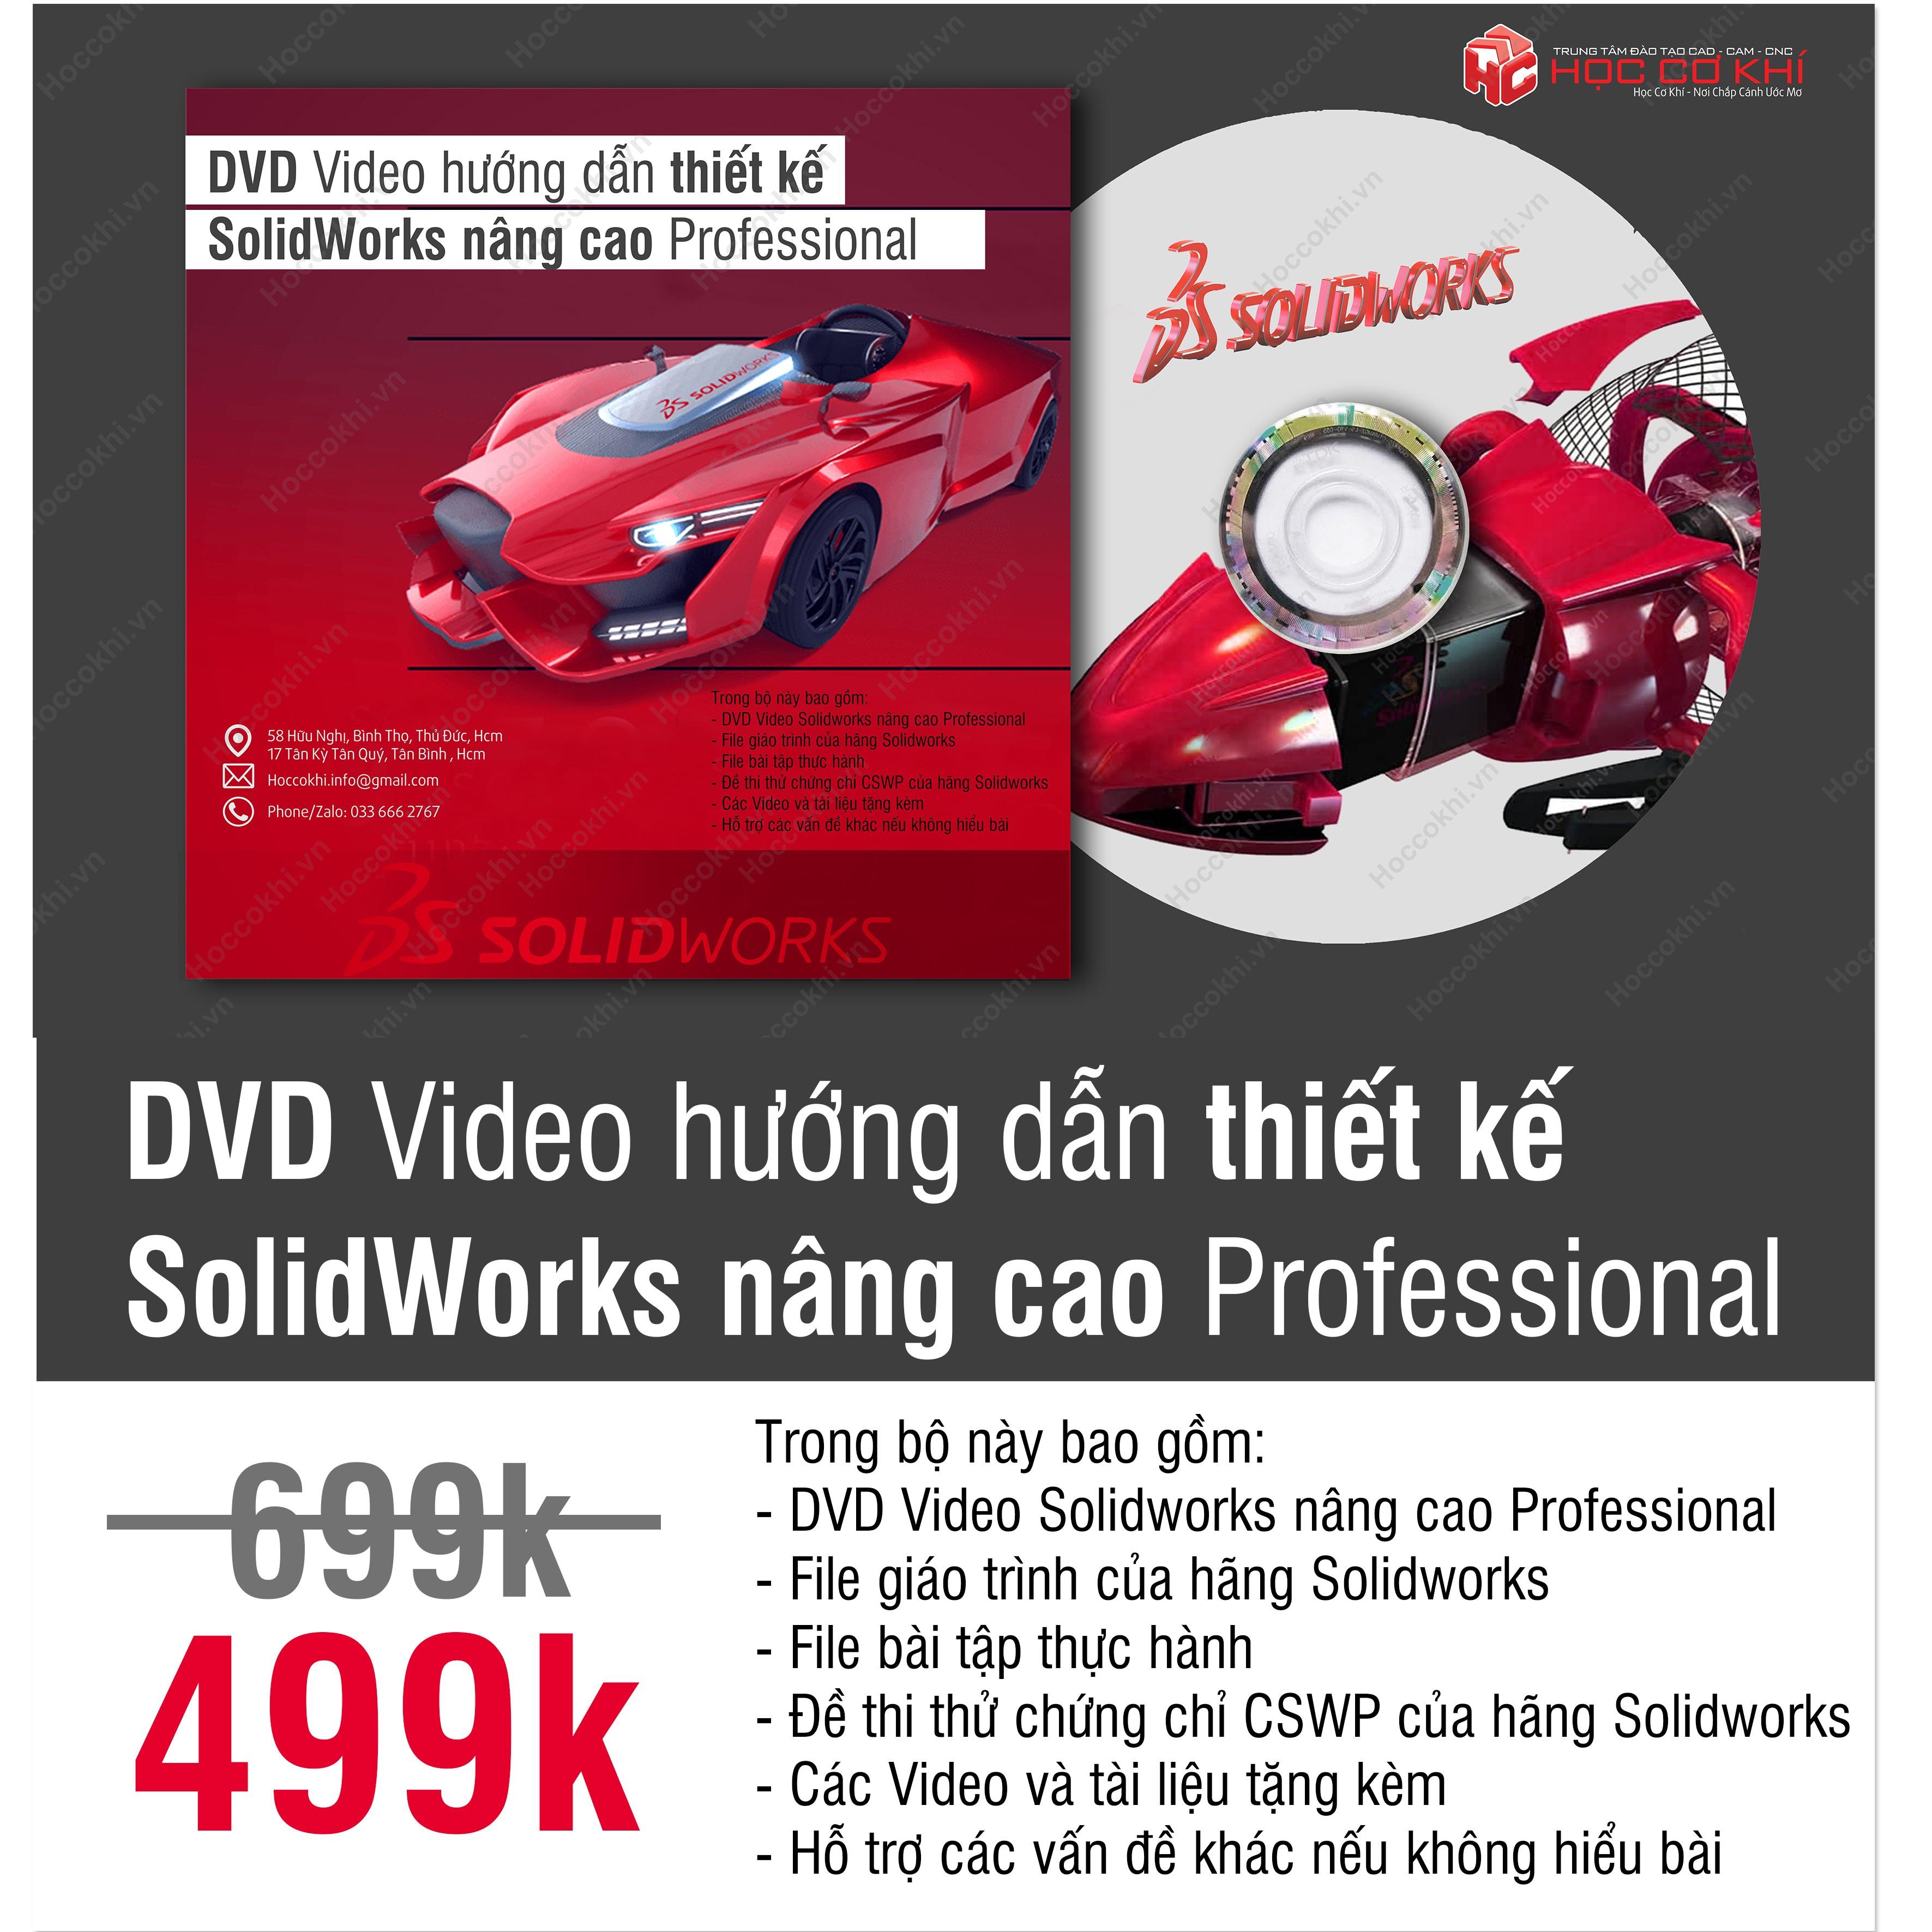 DVD Video hướng dẫn thiết kế SolidWorks nâng cao Professional